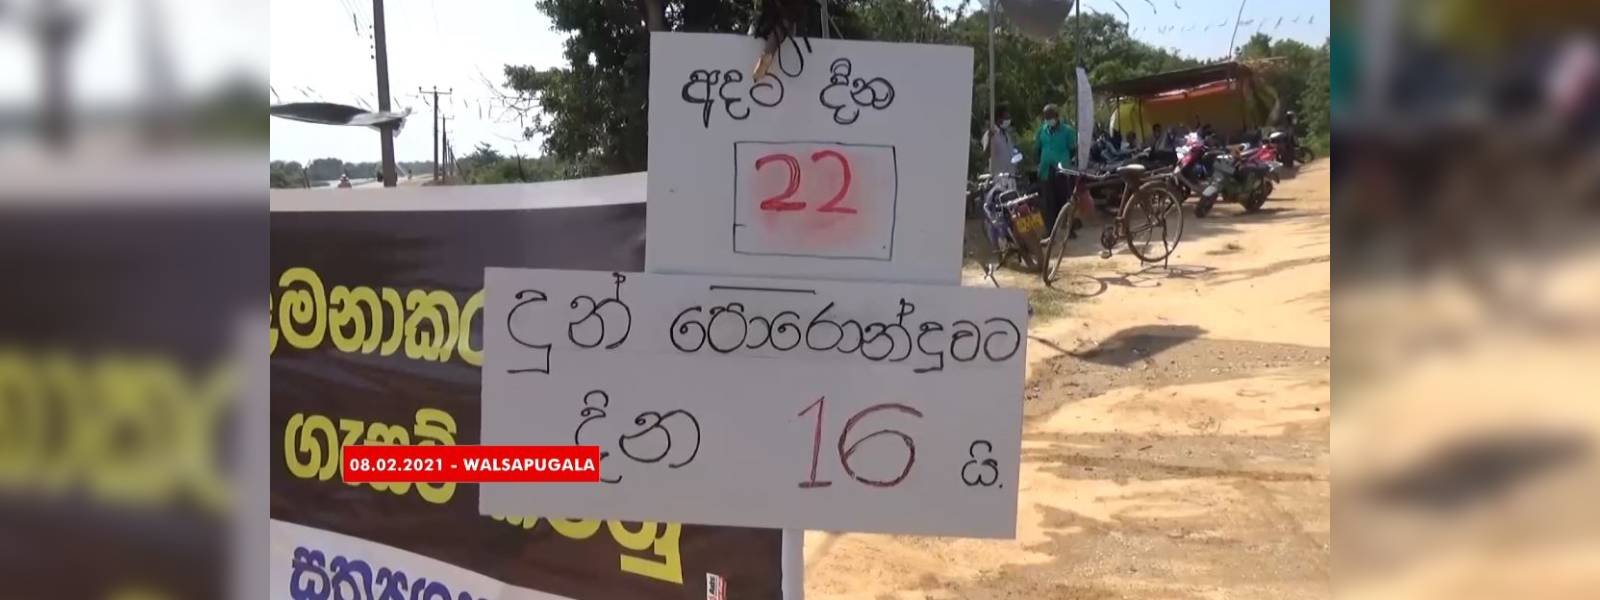 Satyagraha by Walsapugala farmers enters 22nd day